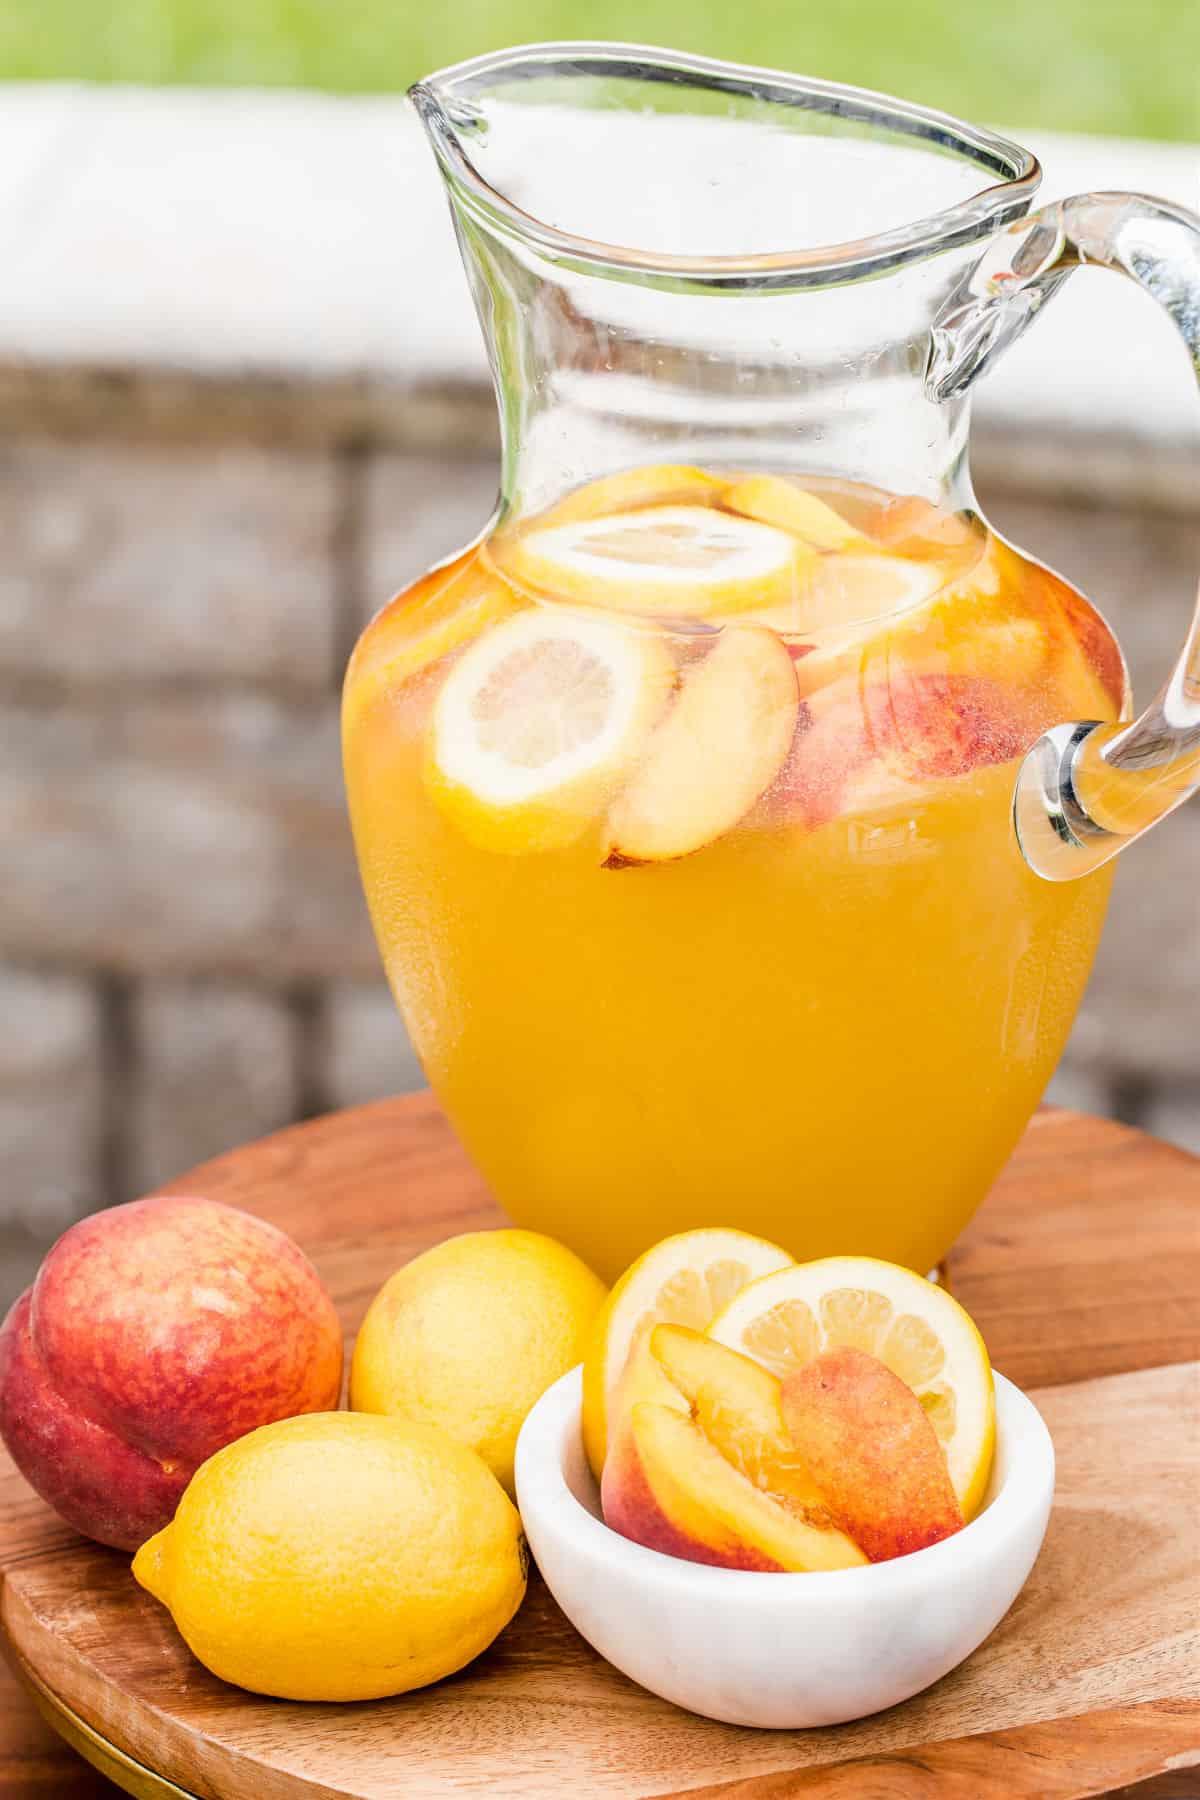 peach lemonade in pitcher with peach and lemons garnish